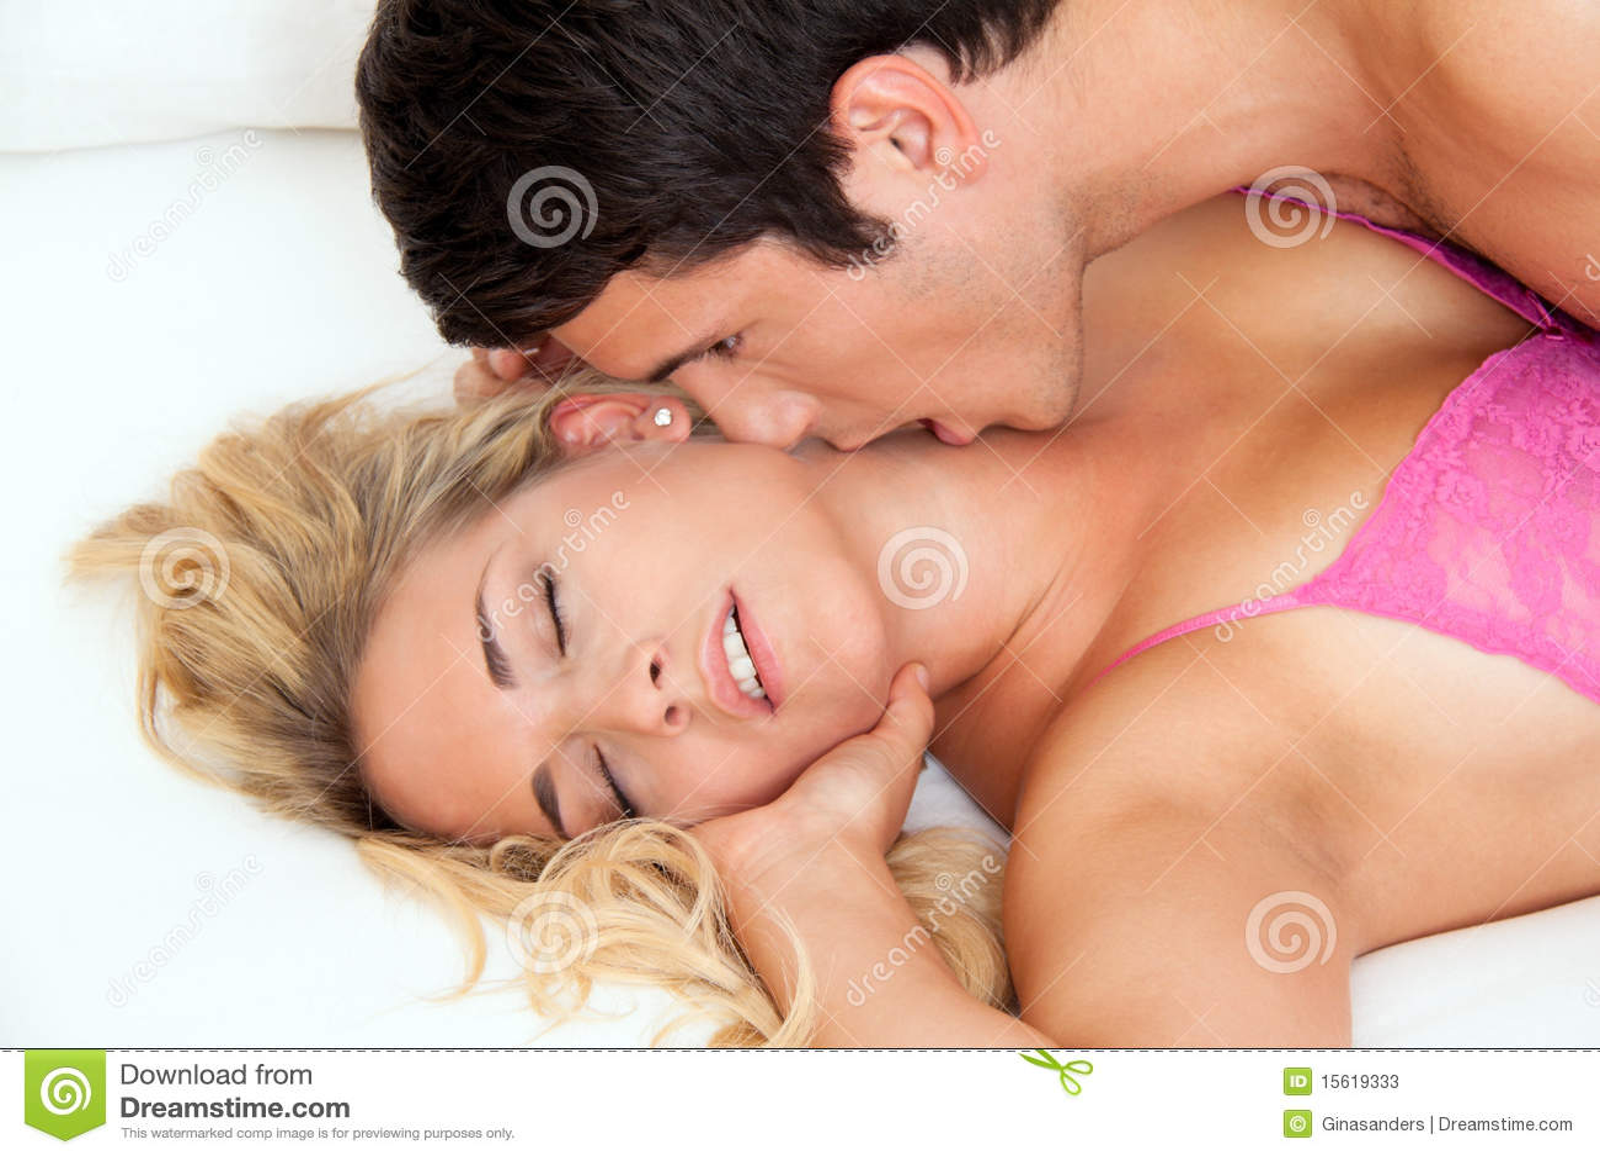 Girls orgasm pics